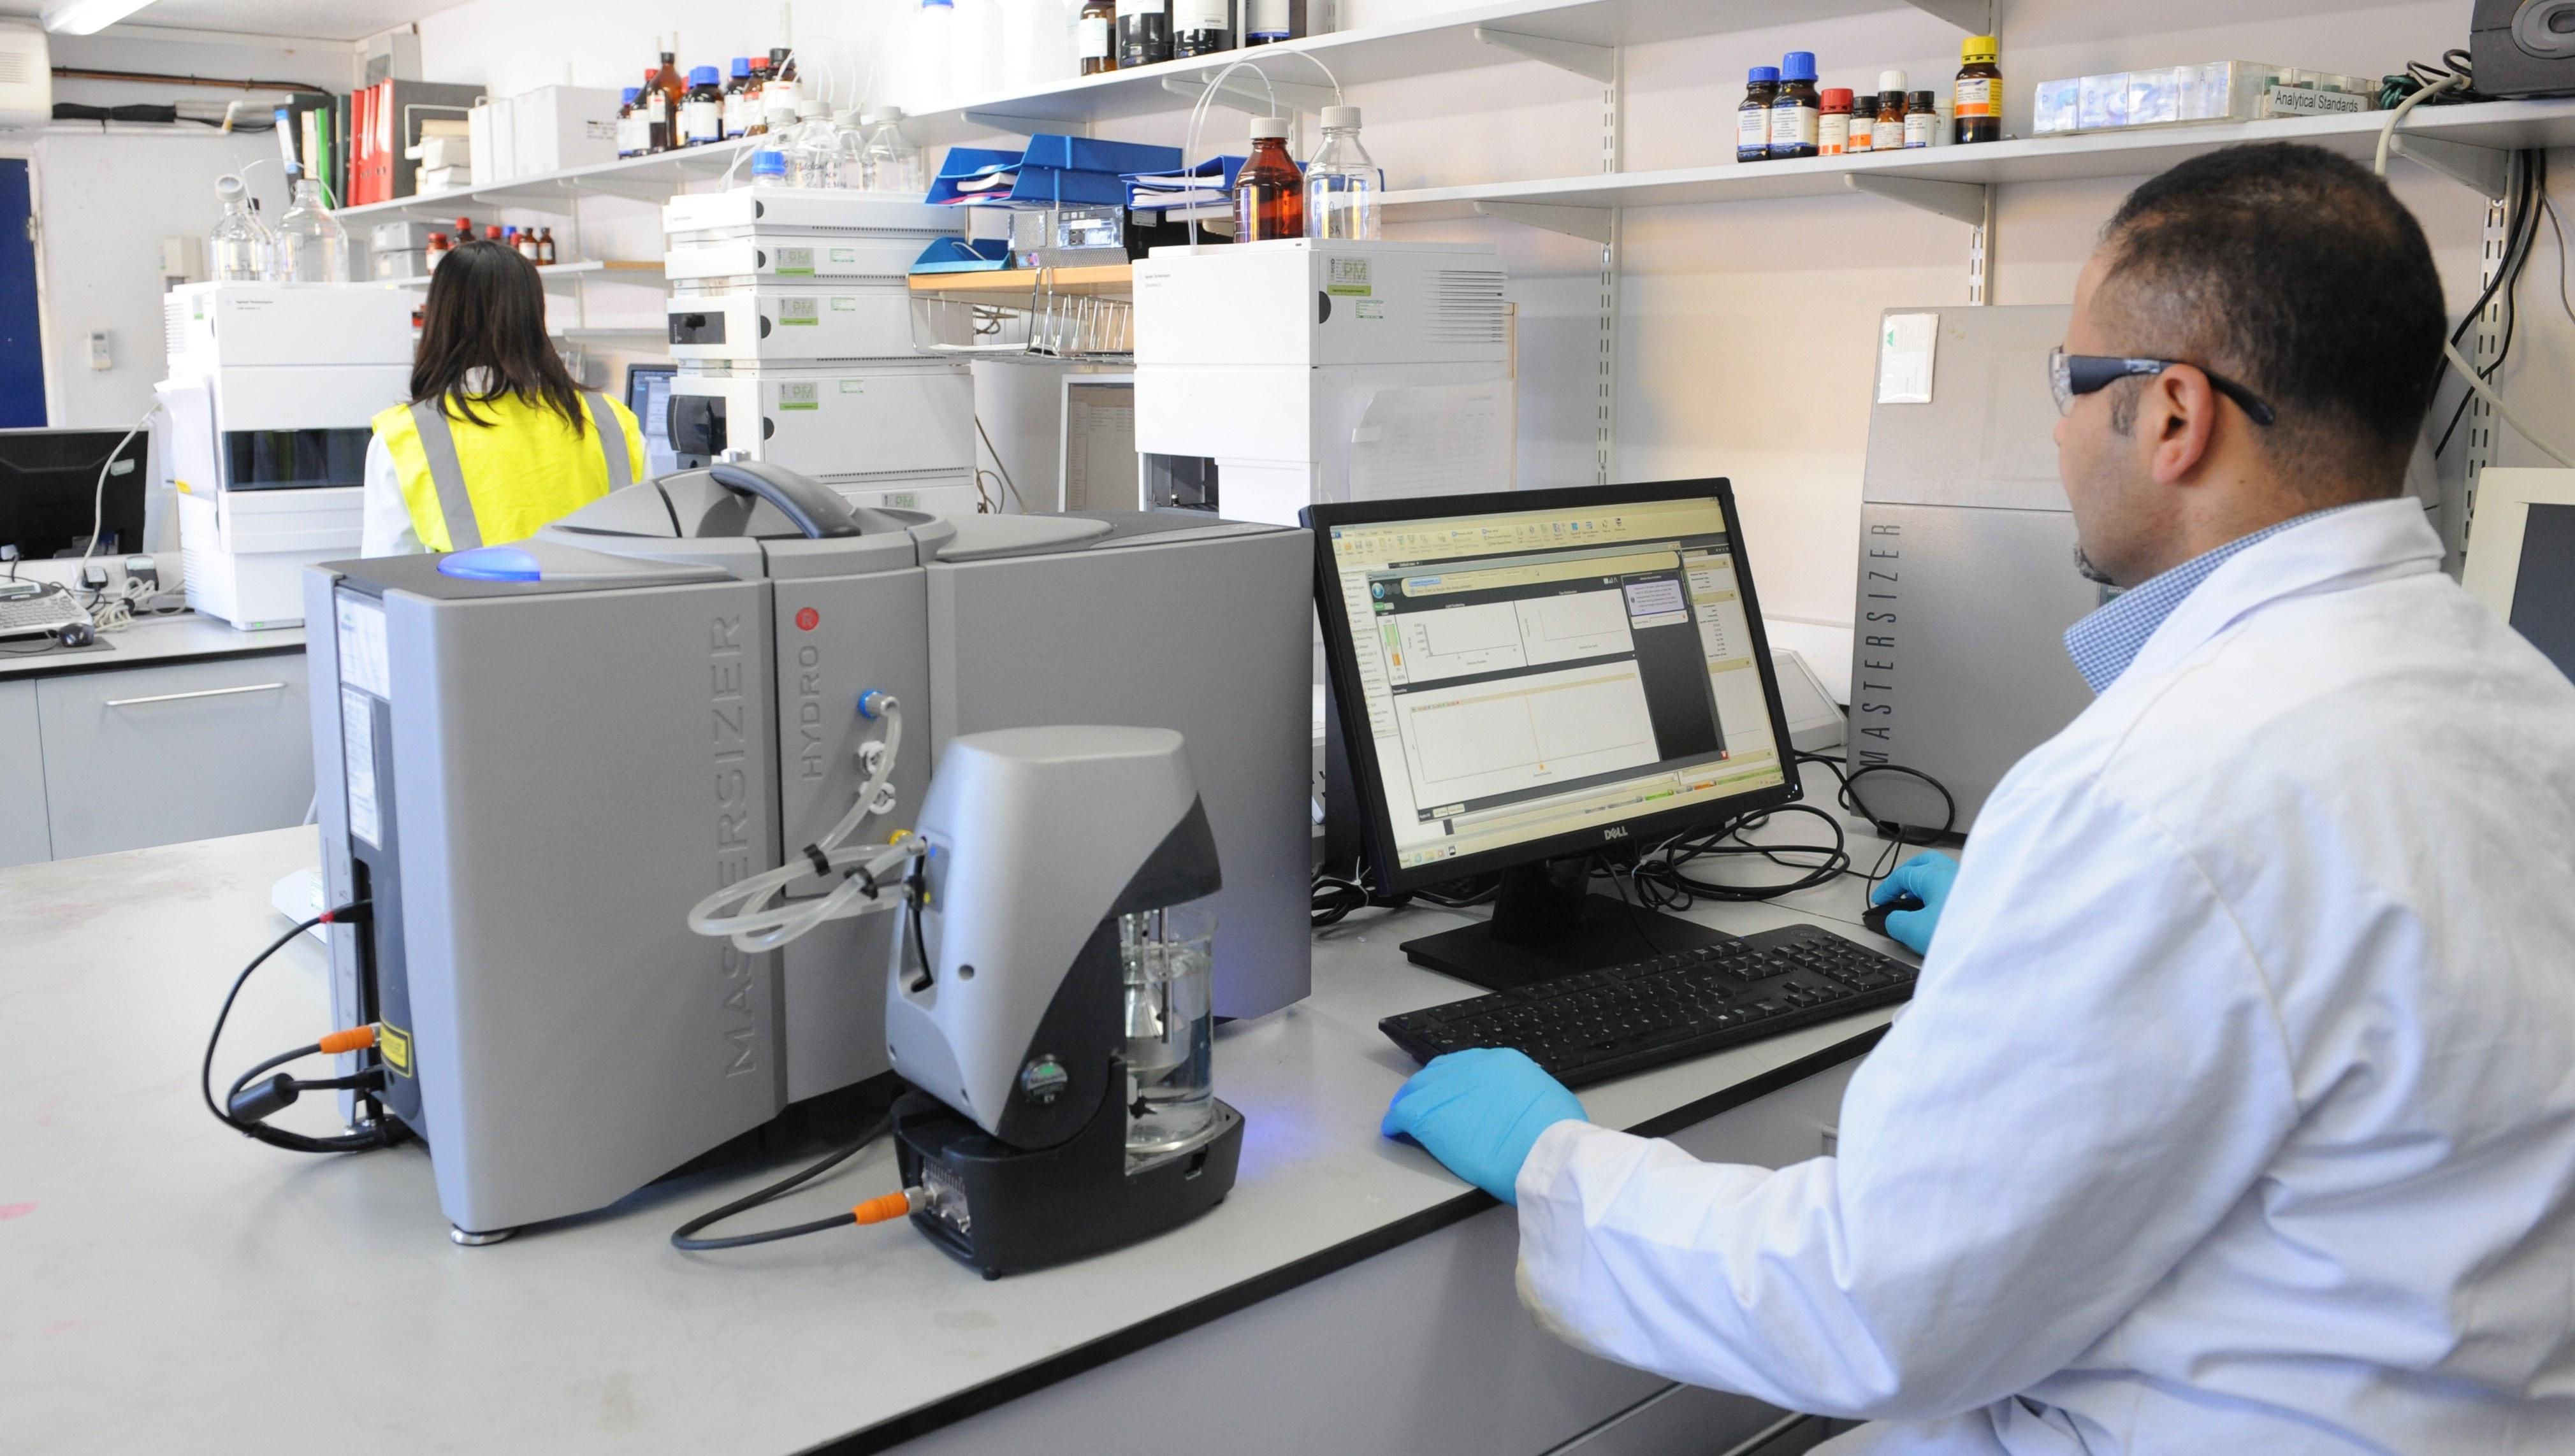 Camari laboratory work